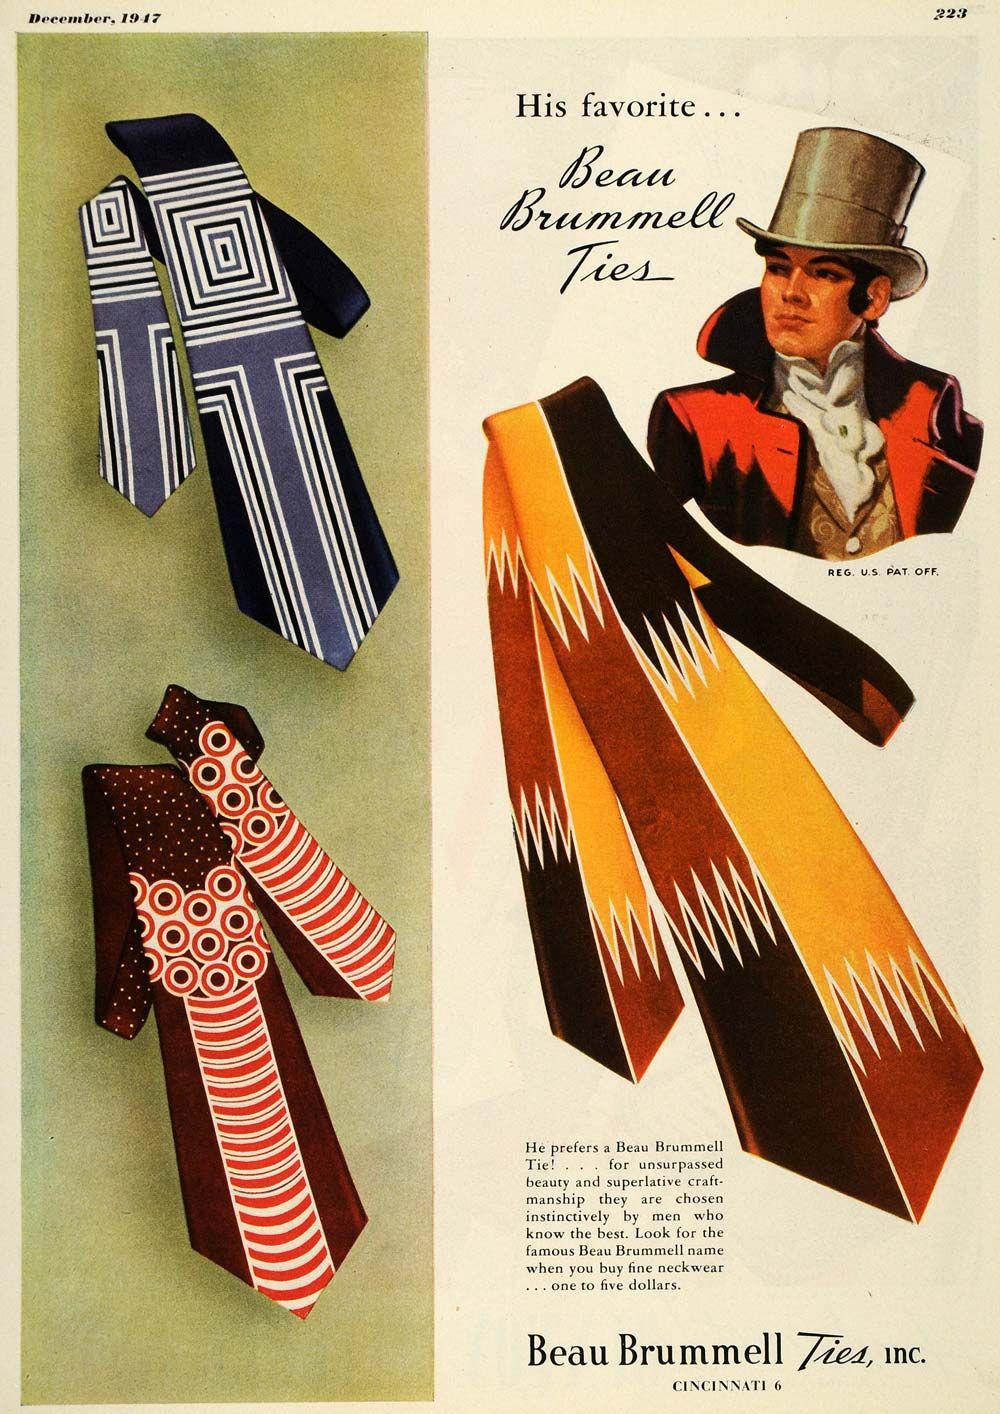 1947 Ad Beau Brummell Ties Cincinnati Ohio Fashion Men Original Advertising Vintage Mens Fashion Vintage Clothing Men Beau Brummell